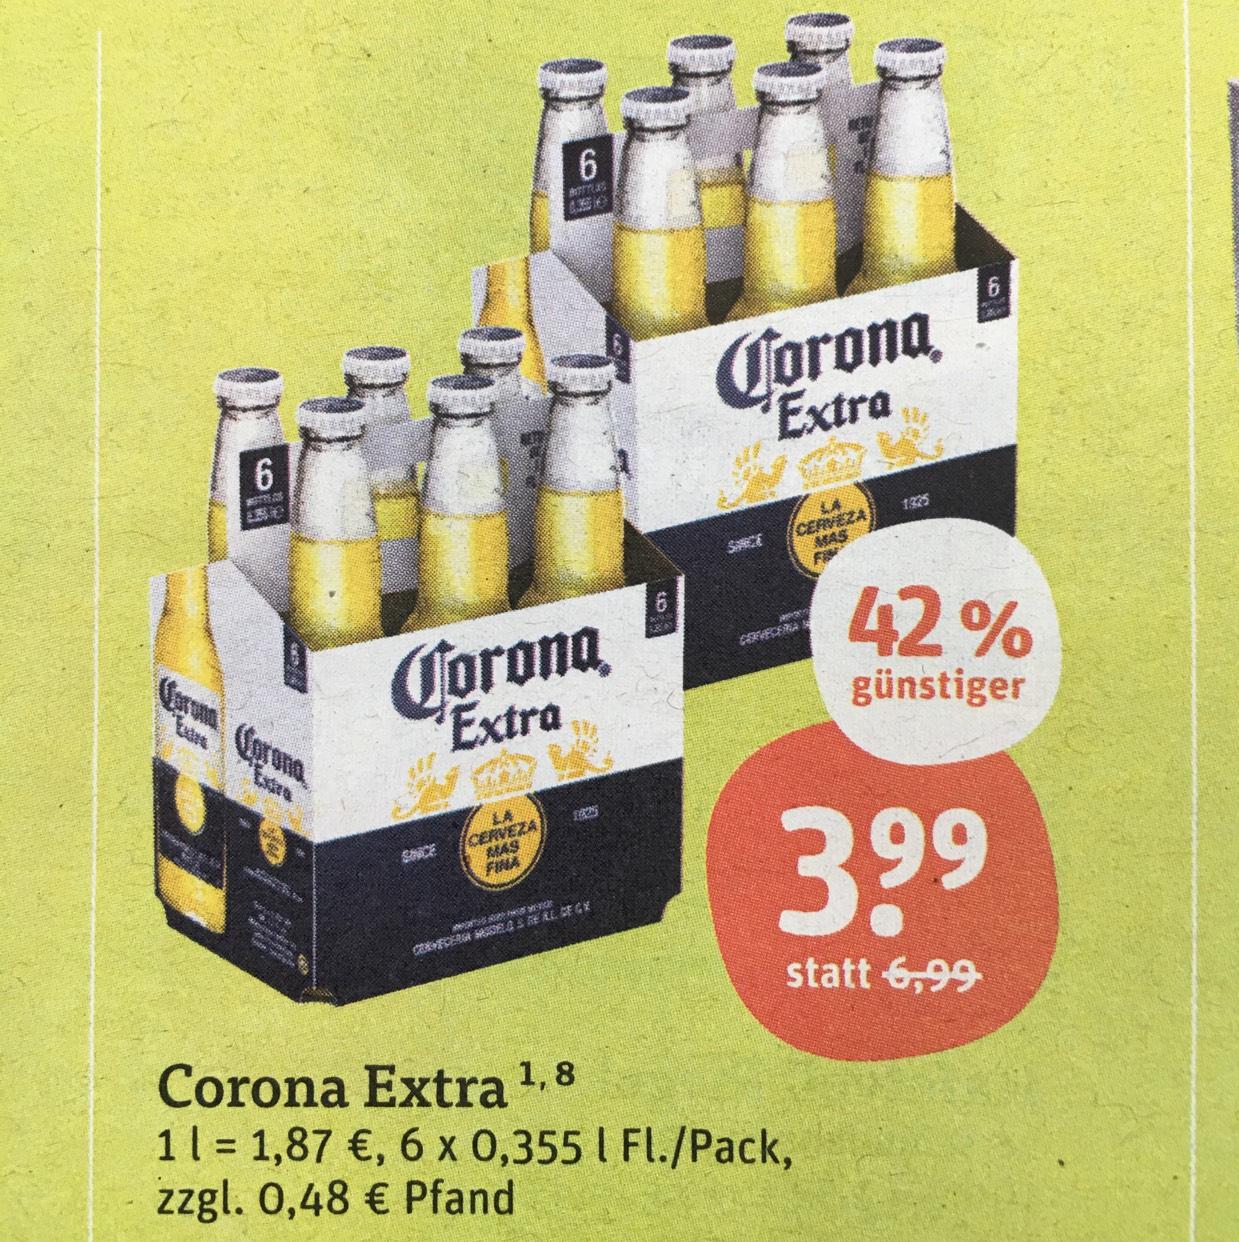 Ab 6. Juni: Corona für 3,99€ statt 6,99€. Überall bei tegut